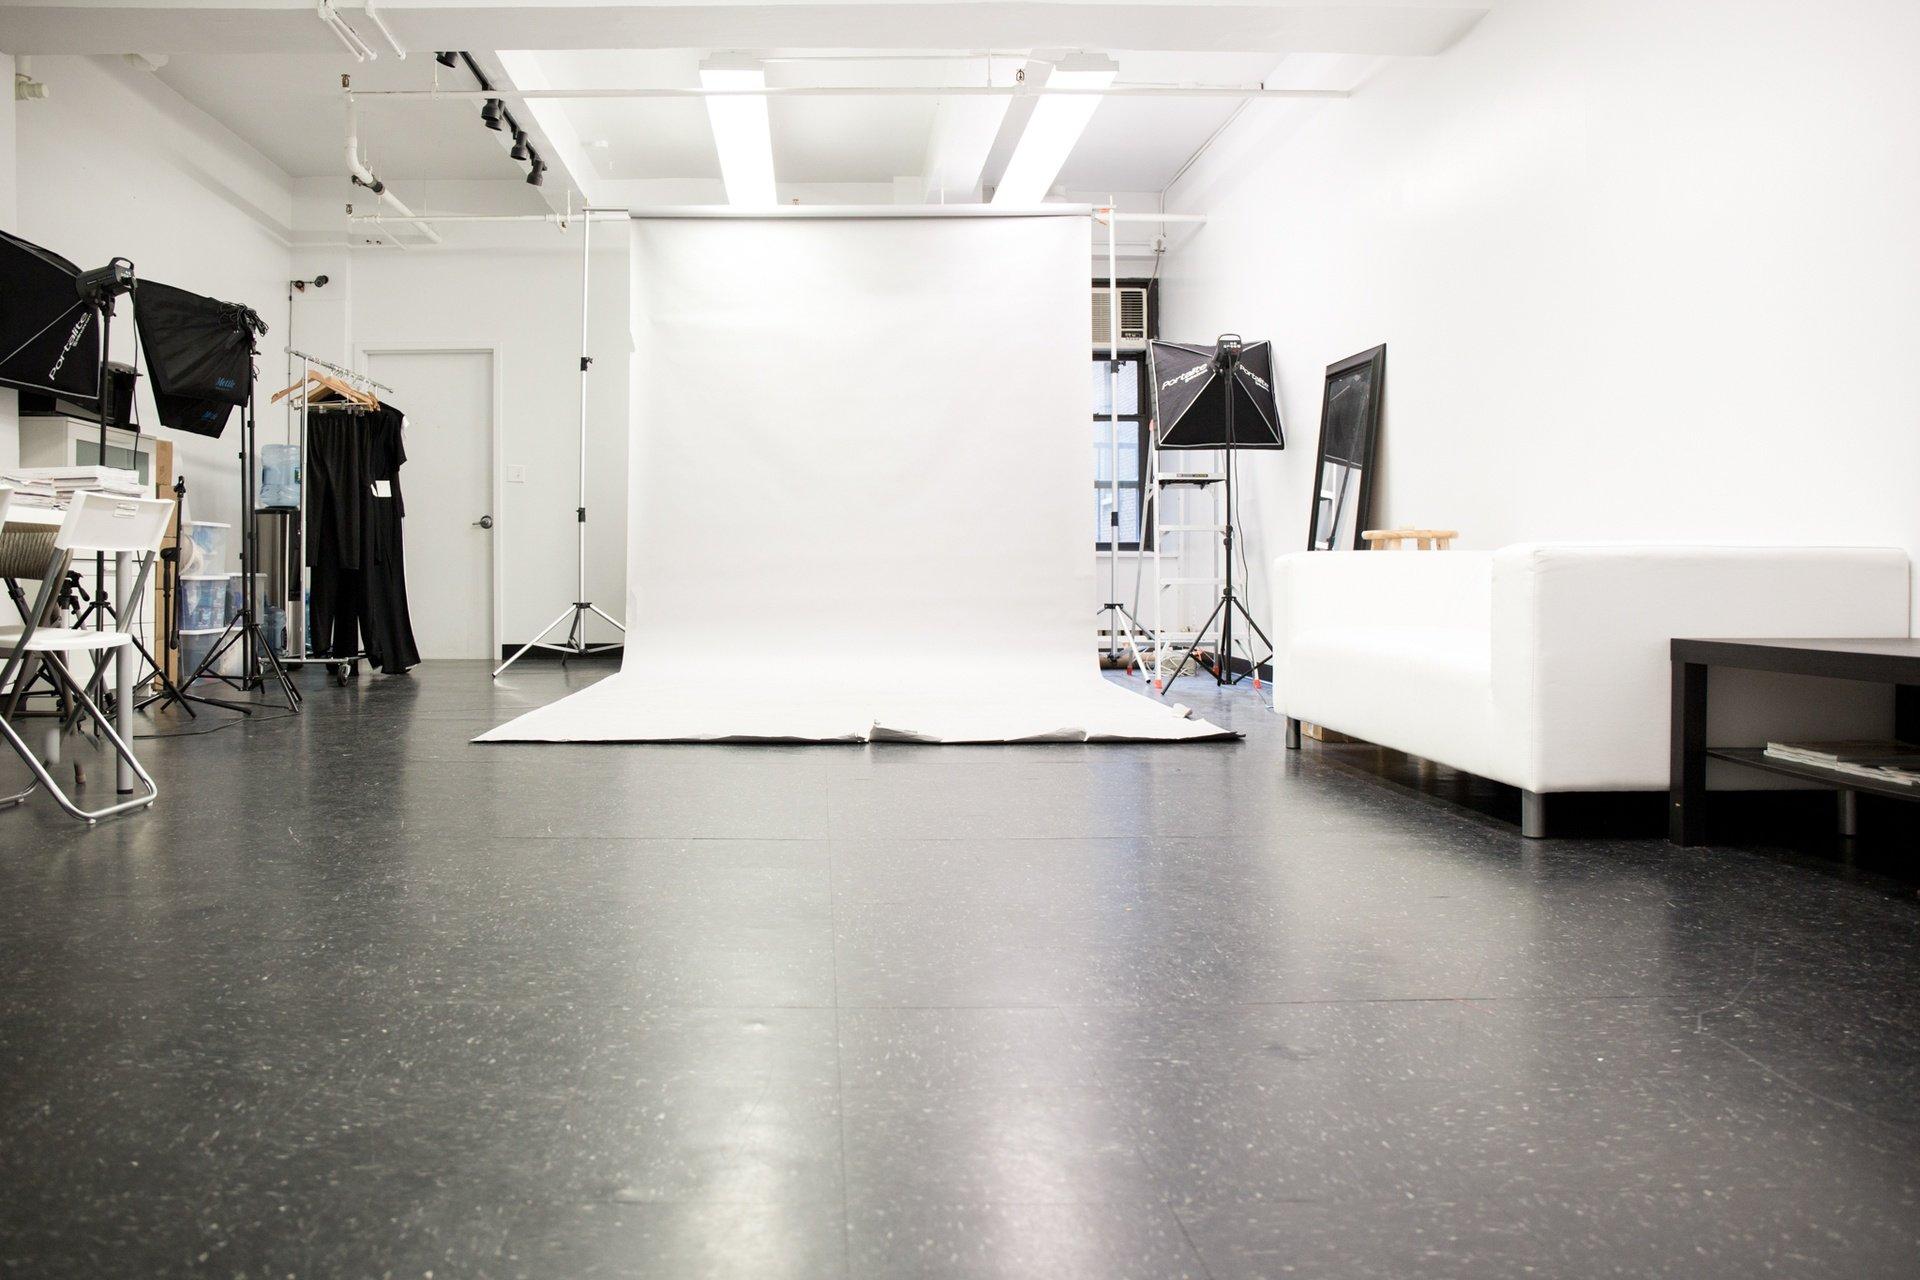 NYC workshop spaces Photography studio XYZ Impression image 3